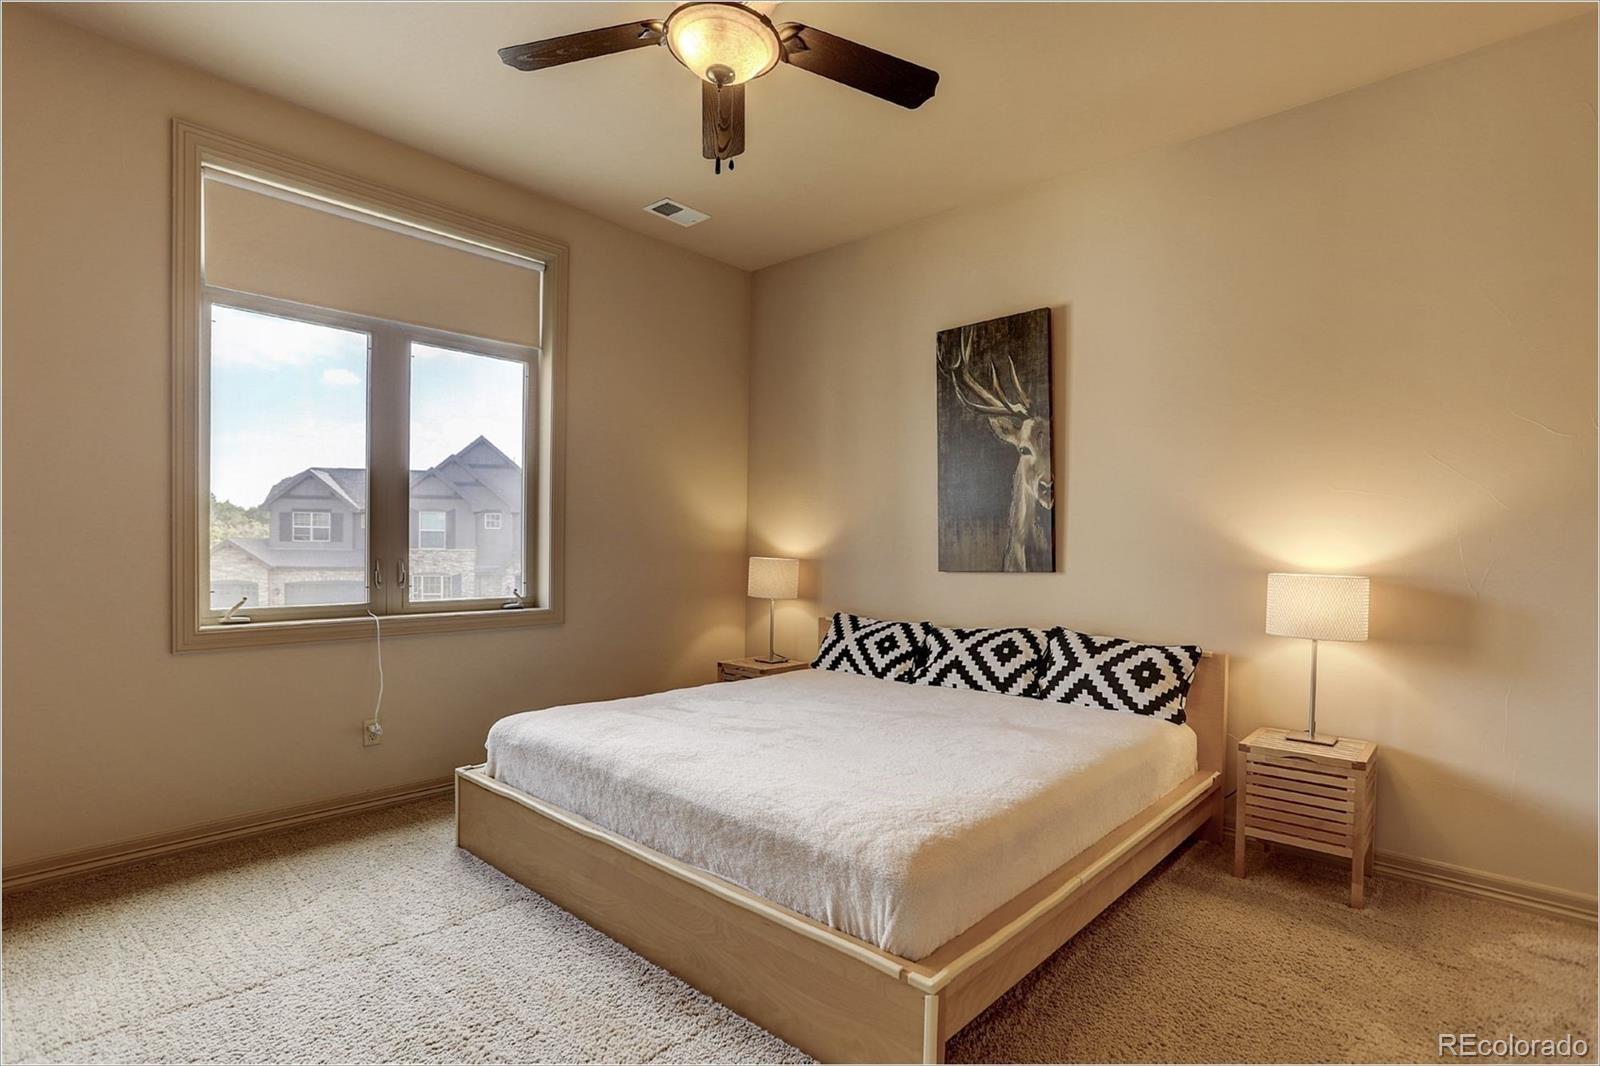 MLS# 6948949 - 34 - 1160 Buffalo Ridge Road, Castle Pines, CO 80108